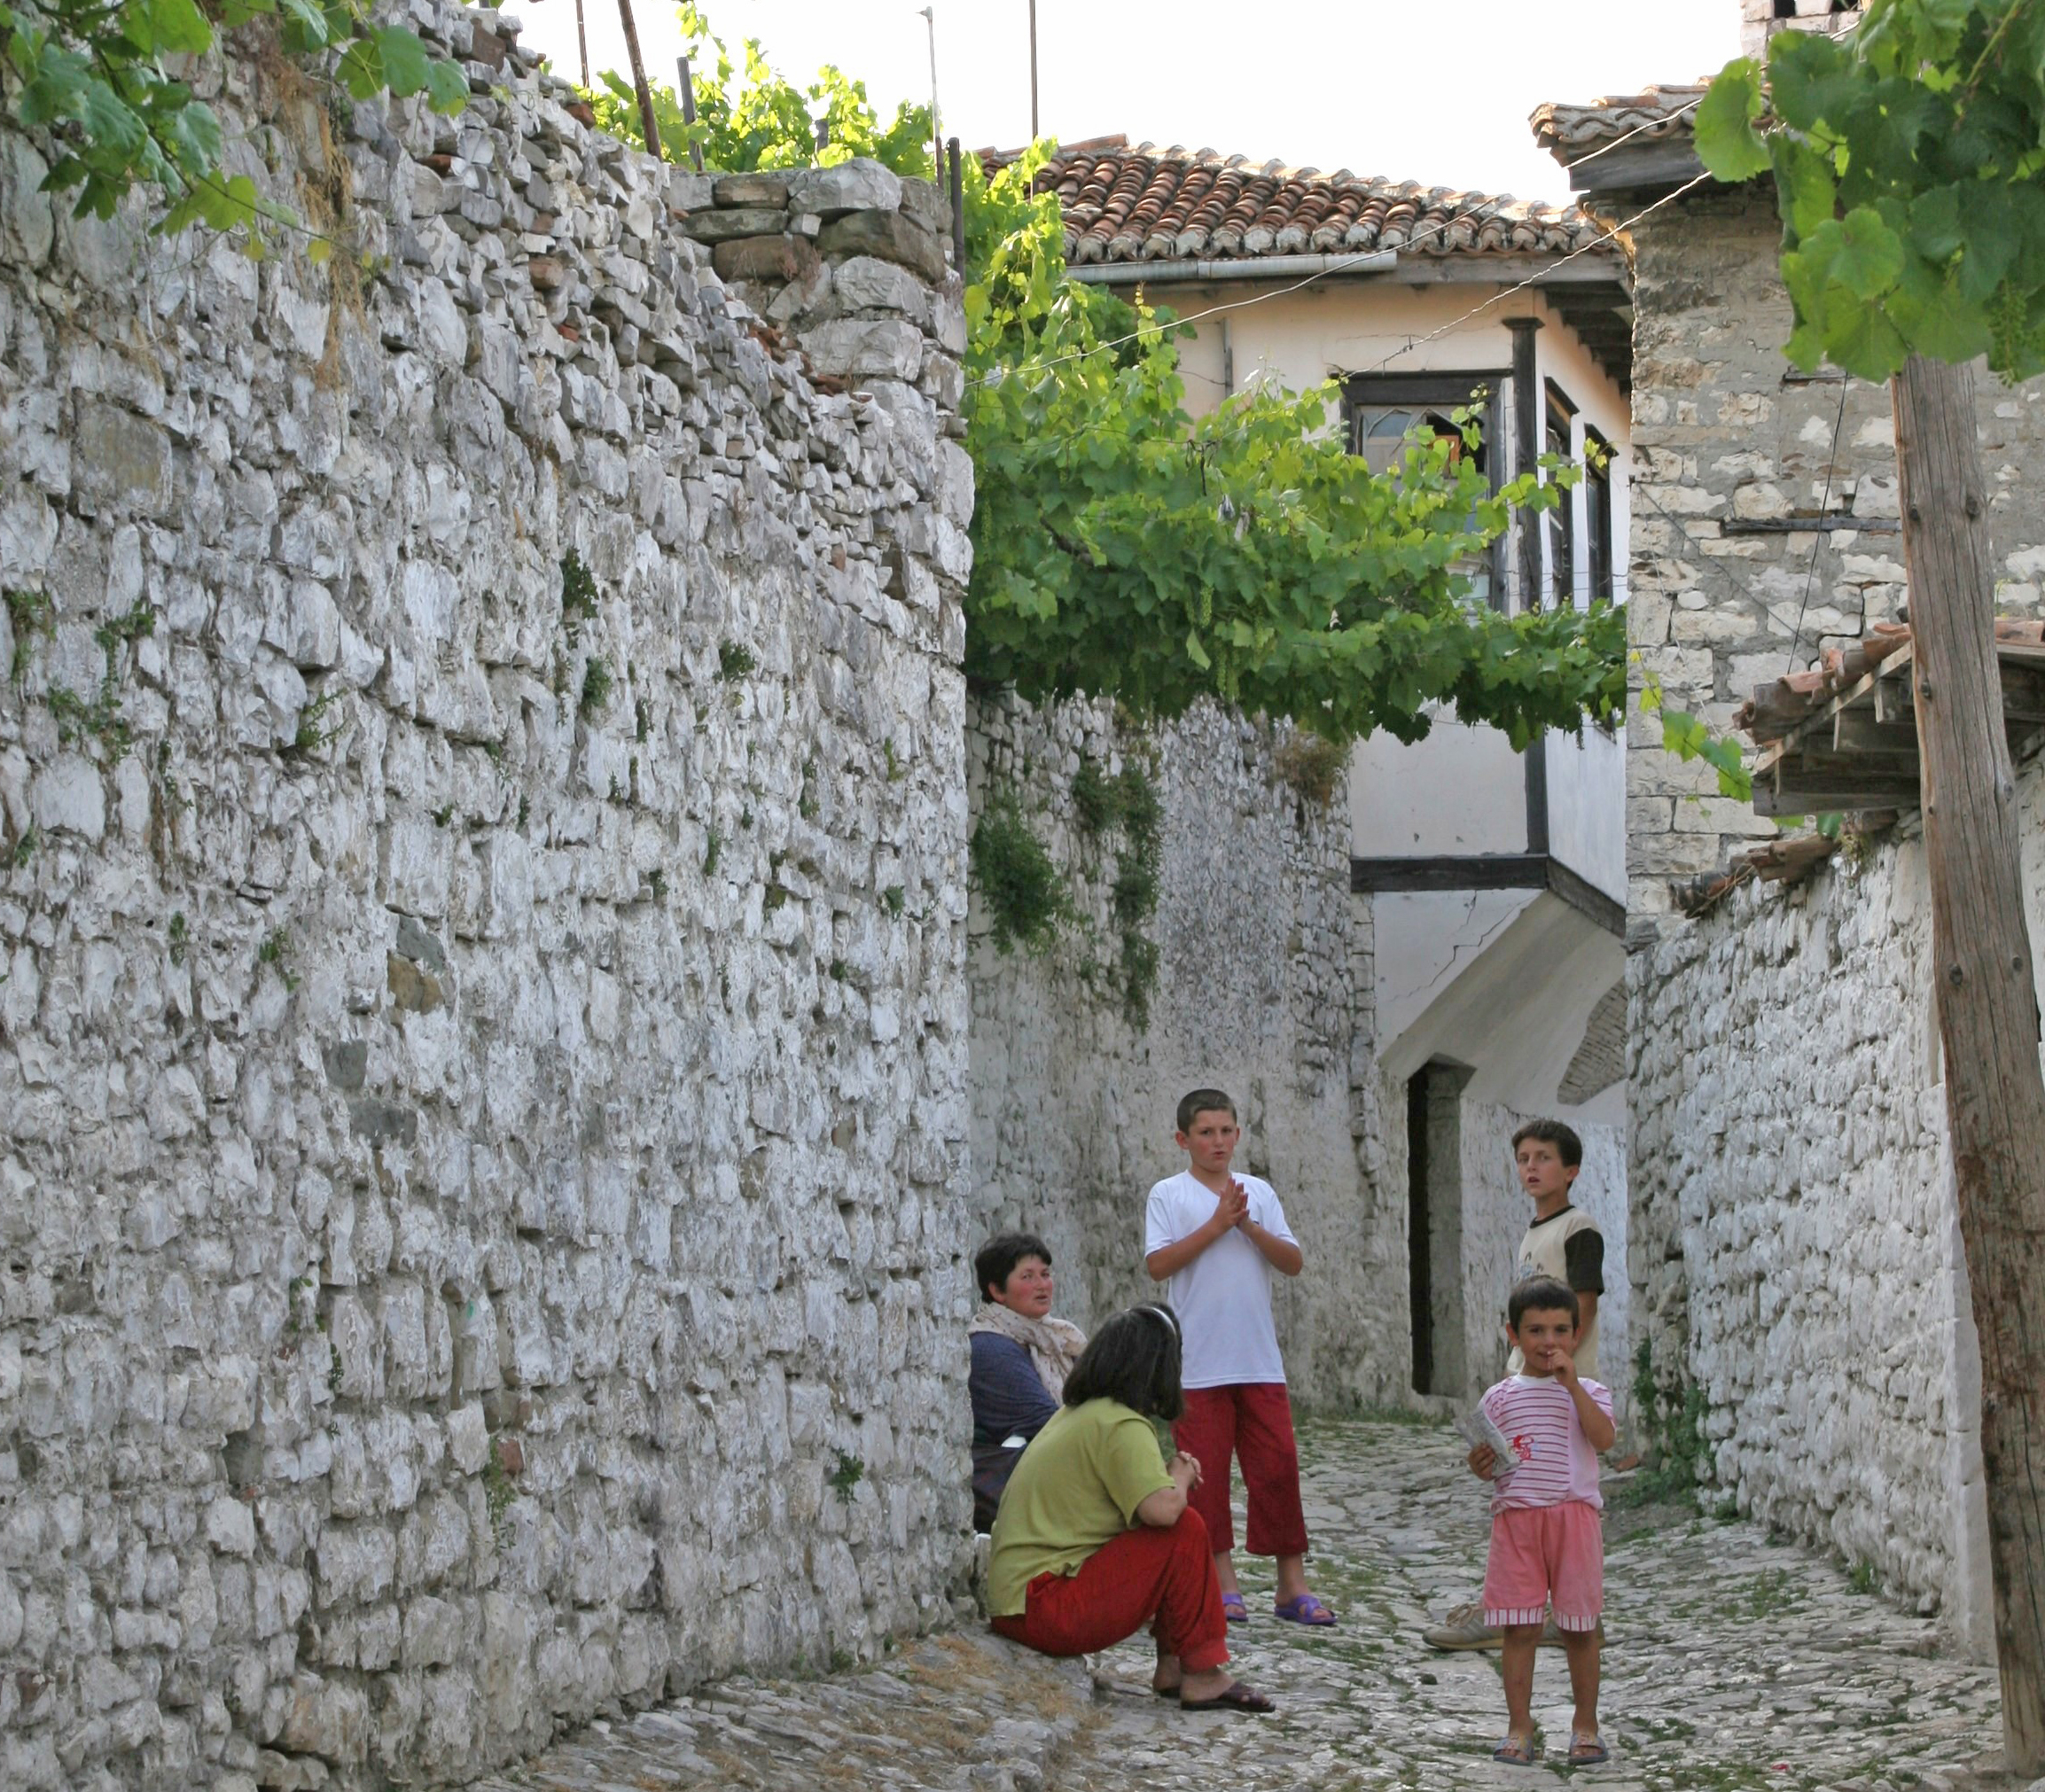 Brosteinidyll med vinranker i hagen i Beratis øverste del.